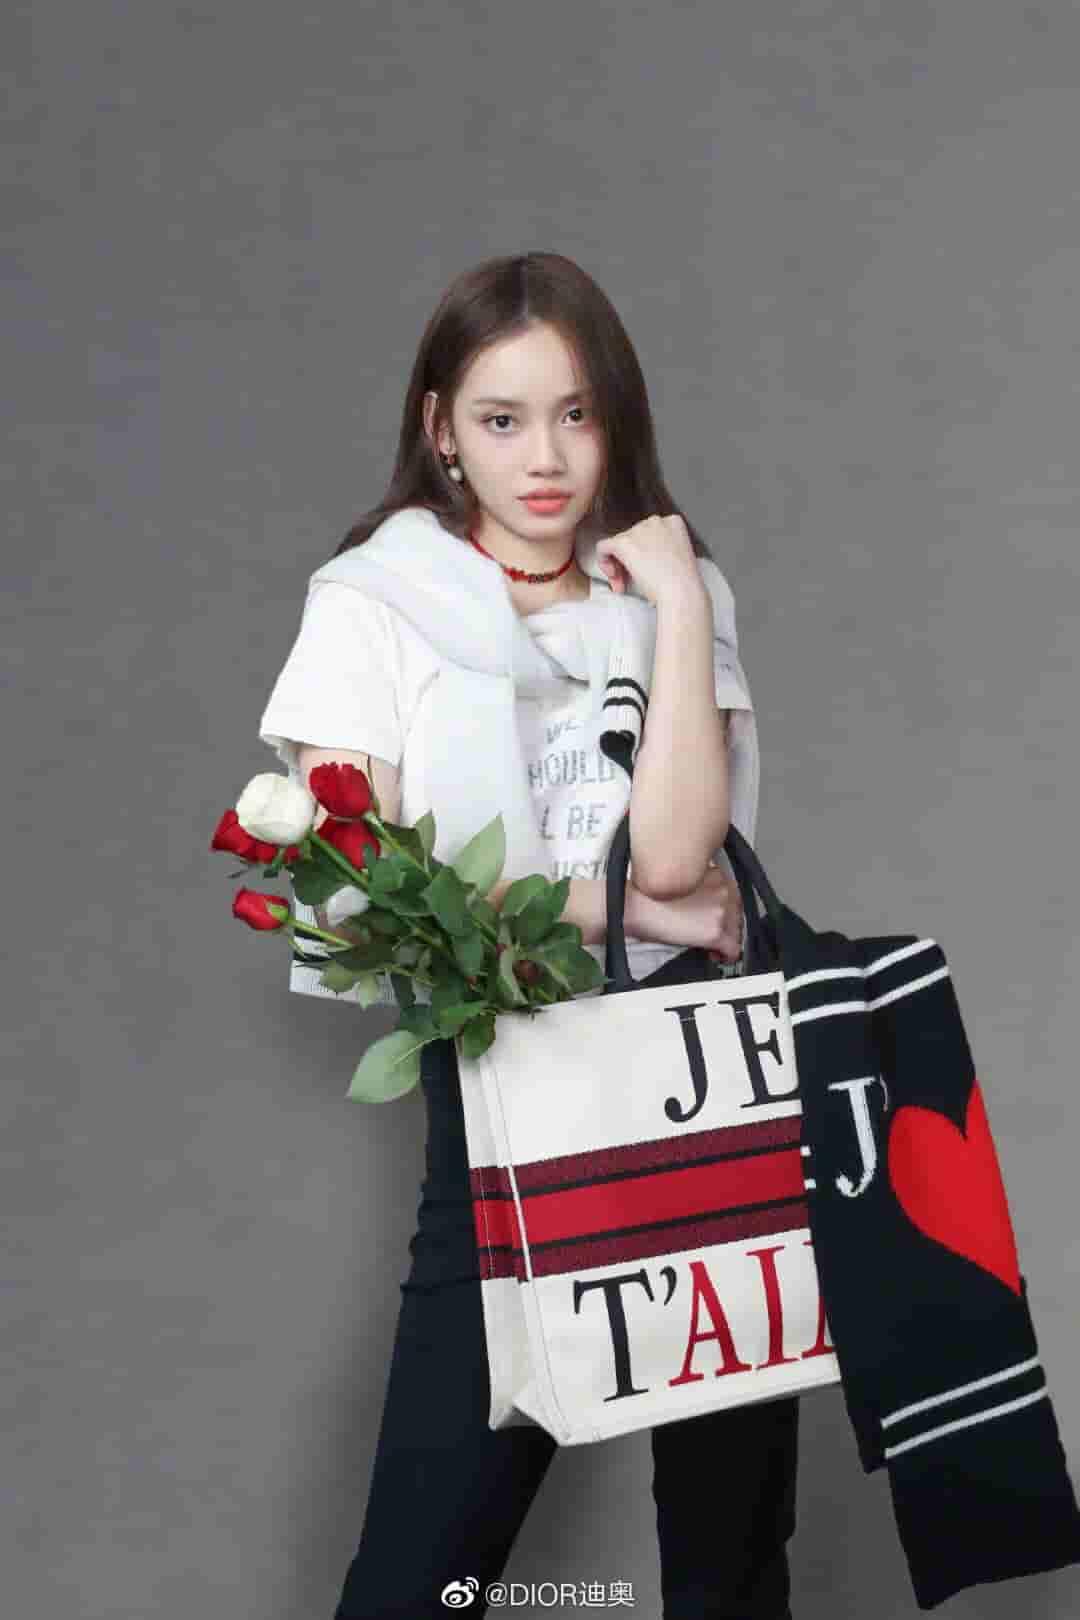 Dior/迪奥 七夕限定BOOK TOTE白色JE T'AIME图案手提购物袋